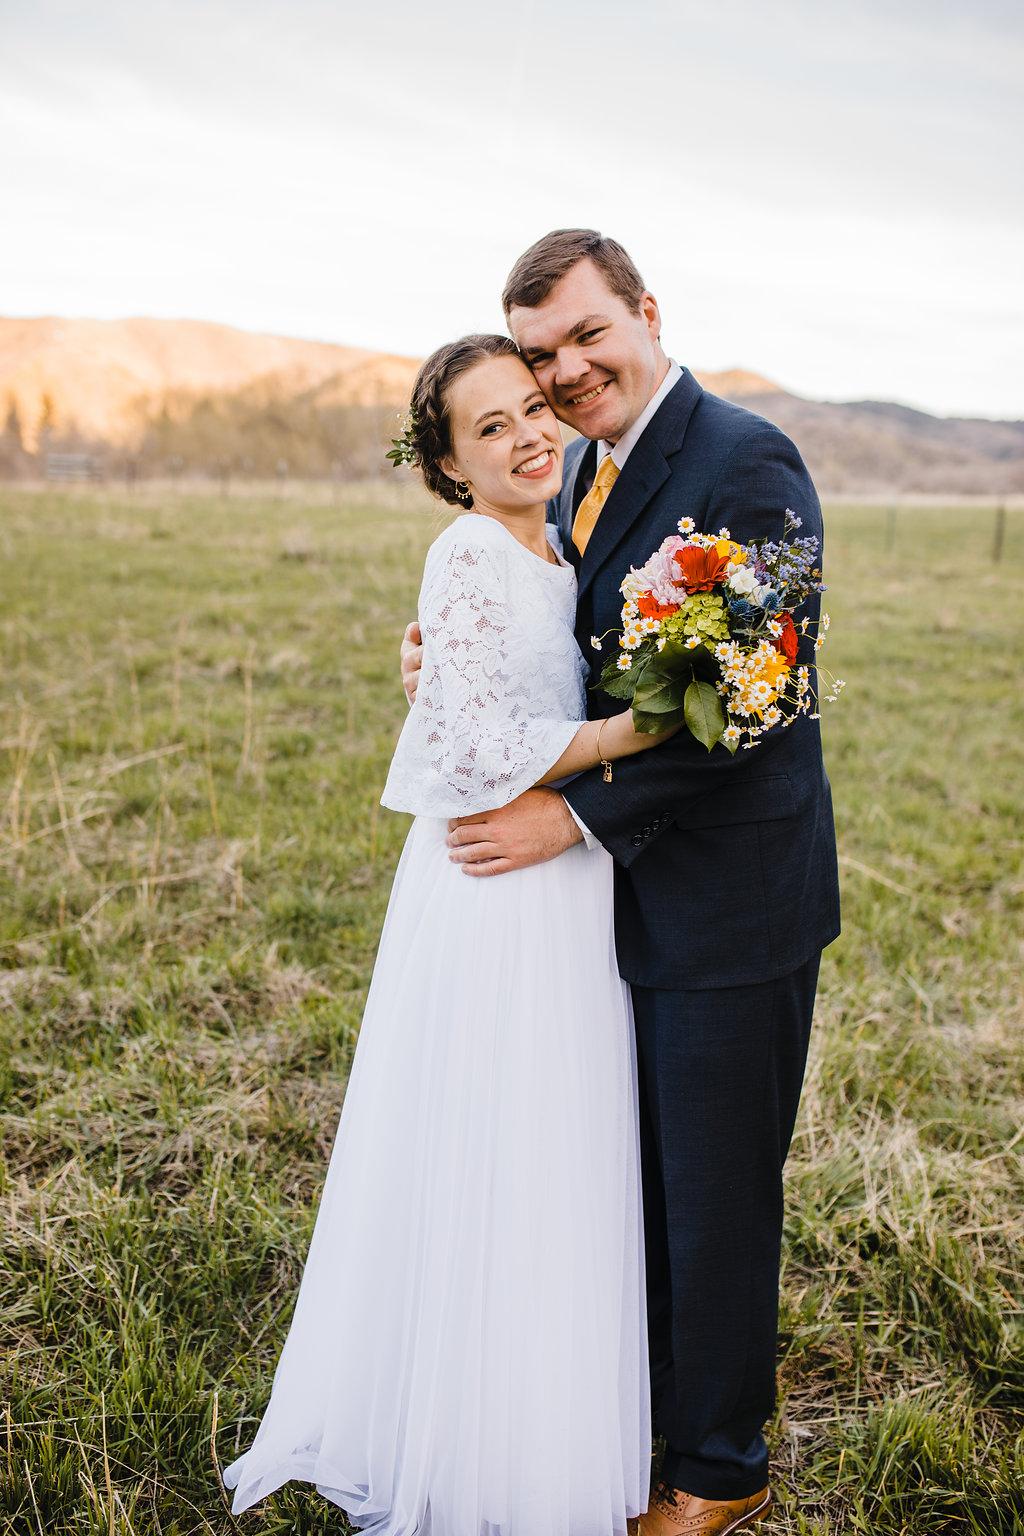 brigham city wedding photographer formals photographer mormon lds young couple modest wedding dress navy groom suit